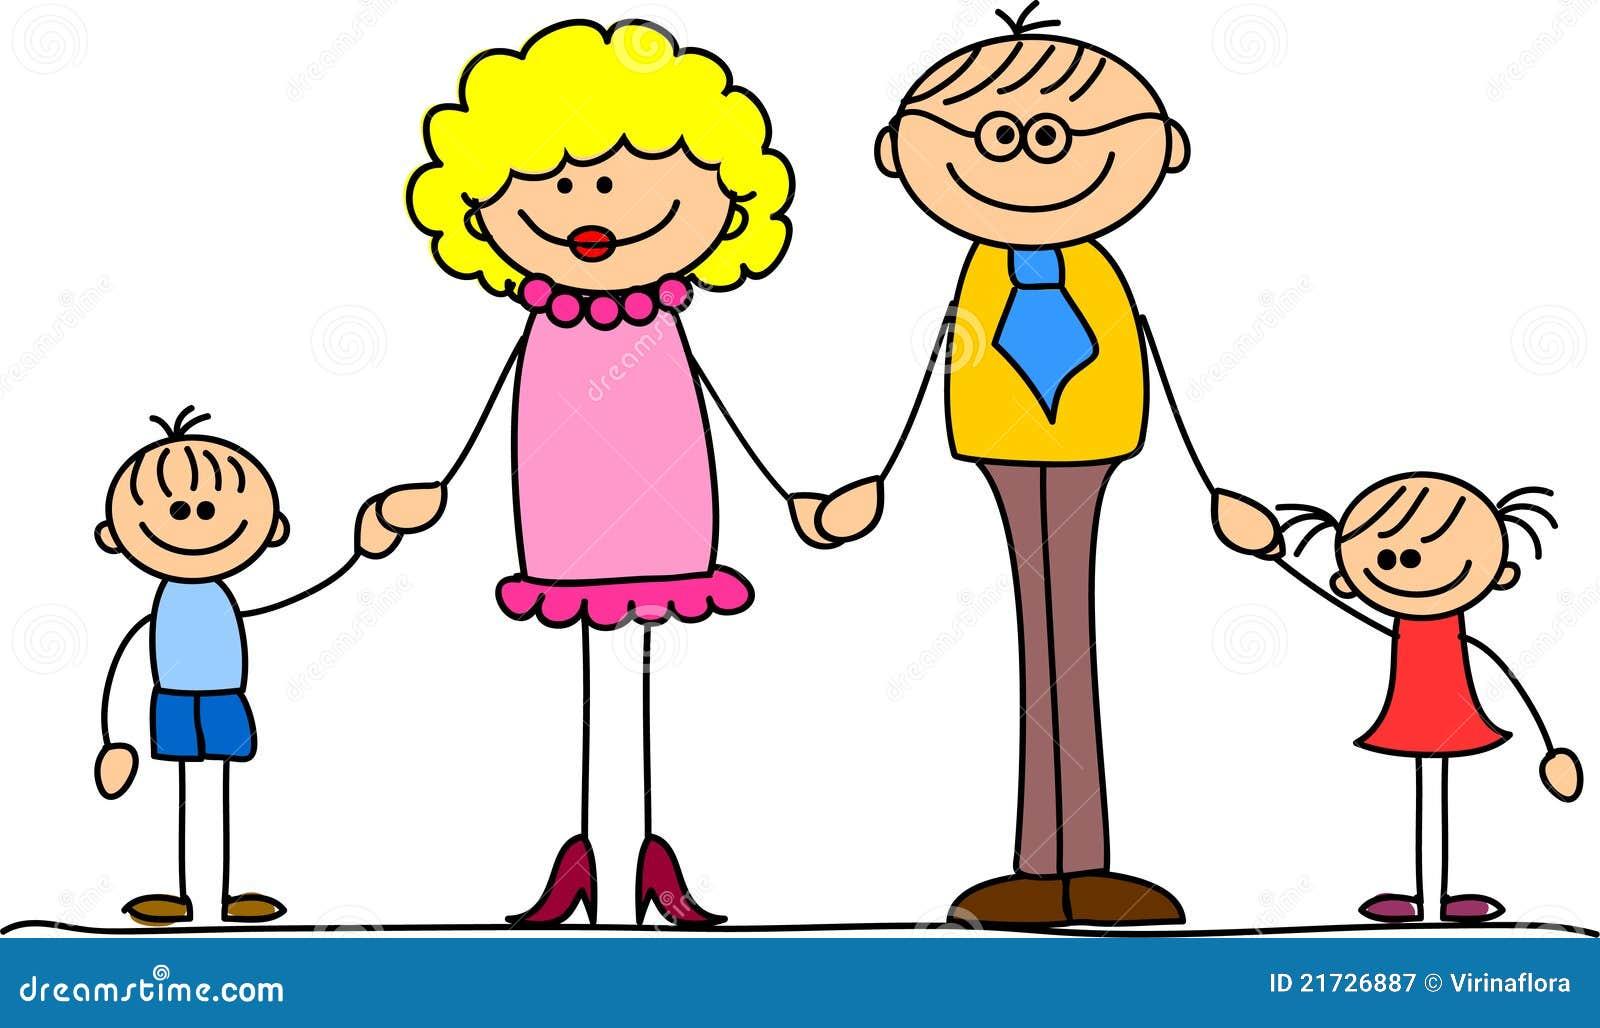 family clip art free downloads - photo #19